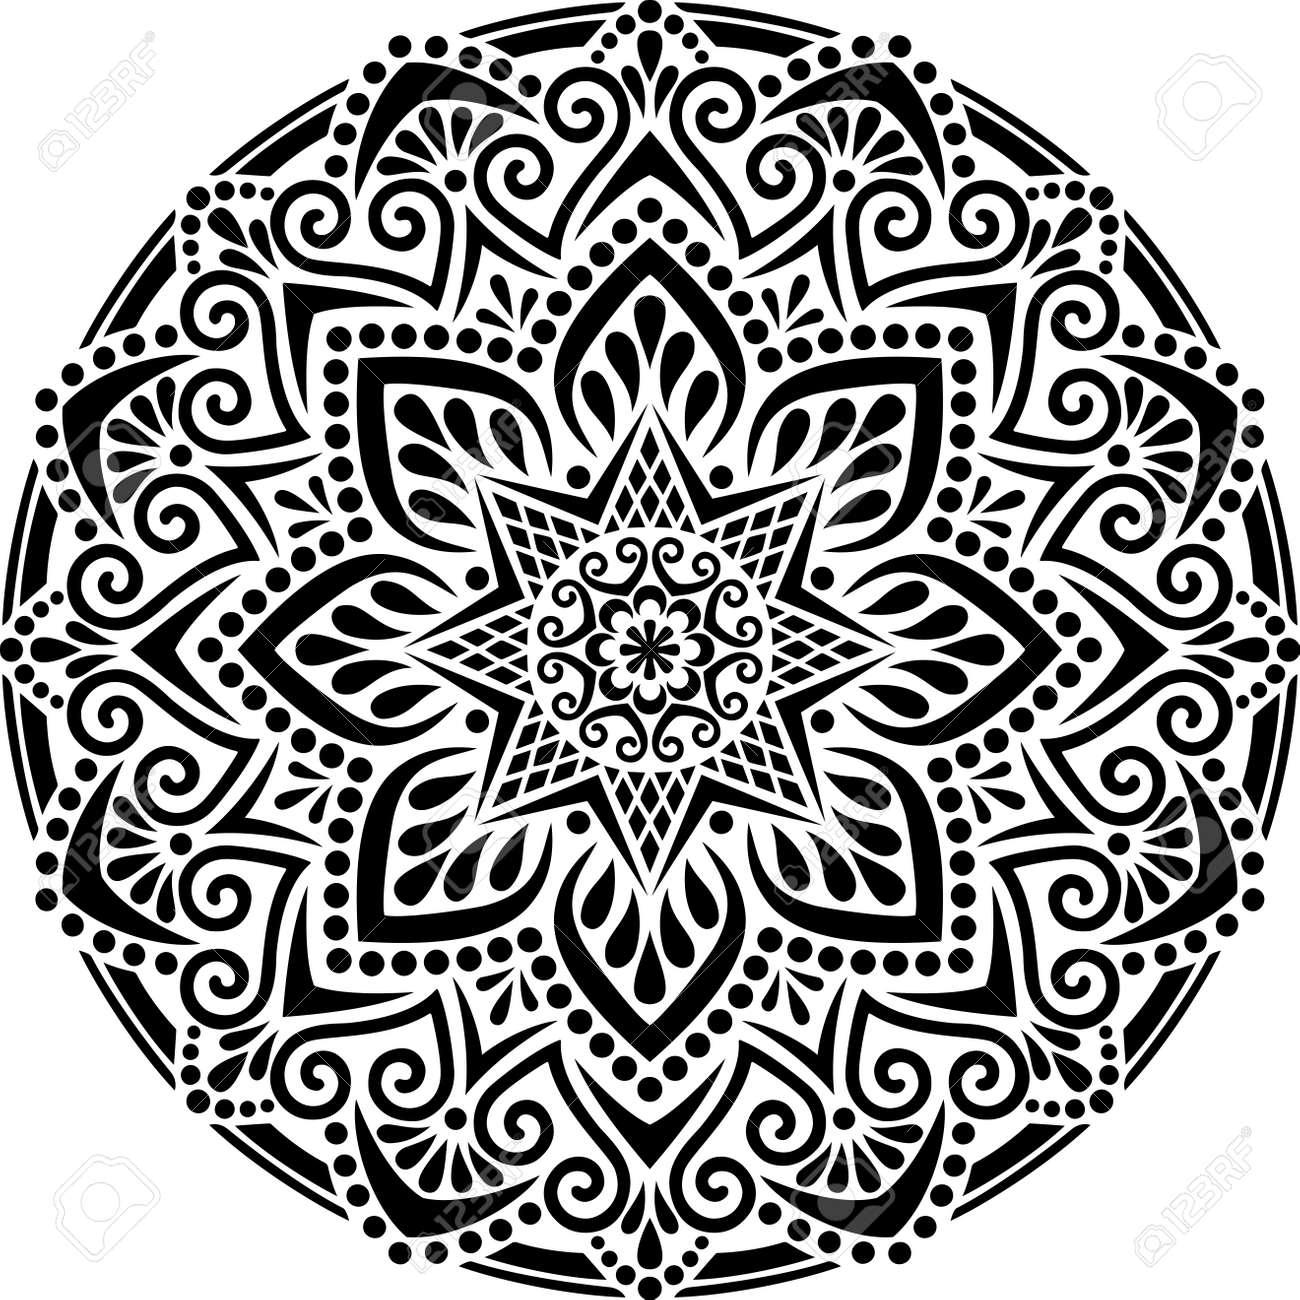 Mandala Pattern Stencil doodles sketch good mood - 154550534